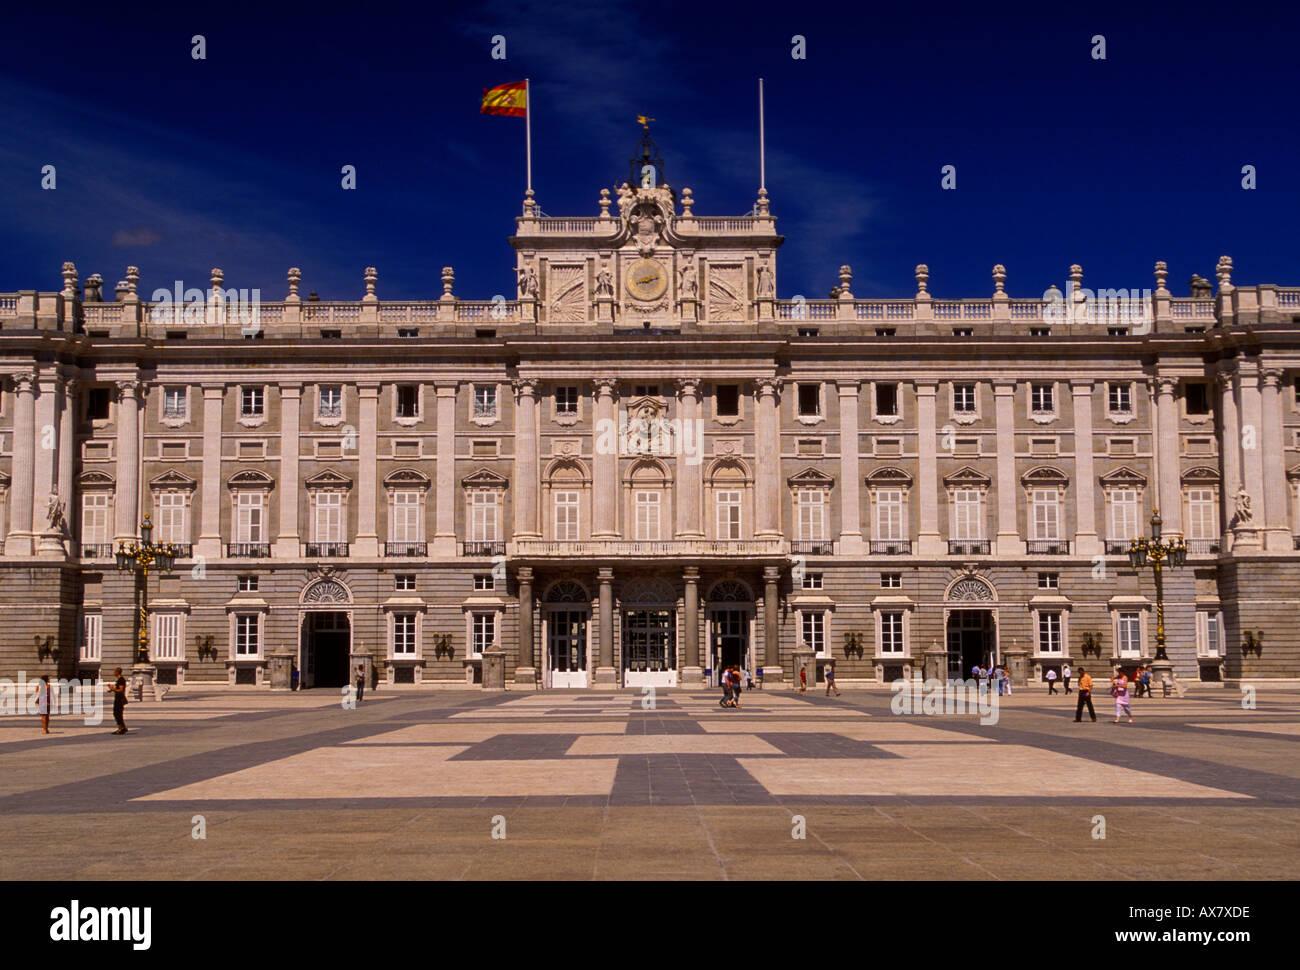 Architettura A Madrid il royal palace, il palacio real, architettura neoclassica